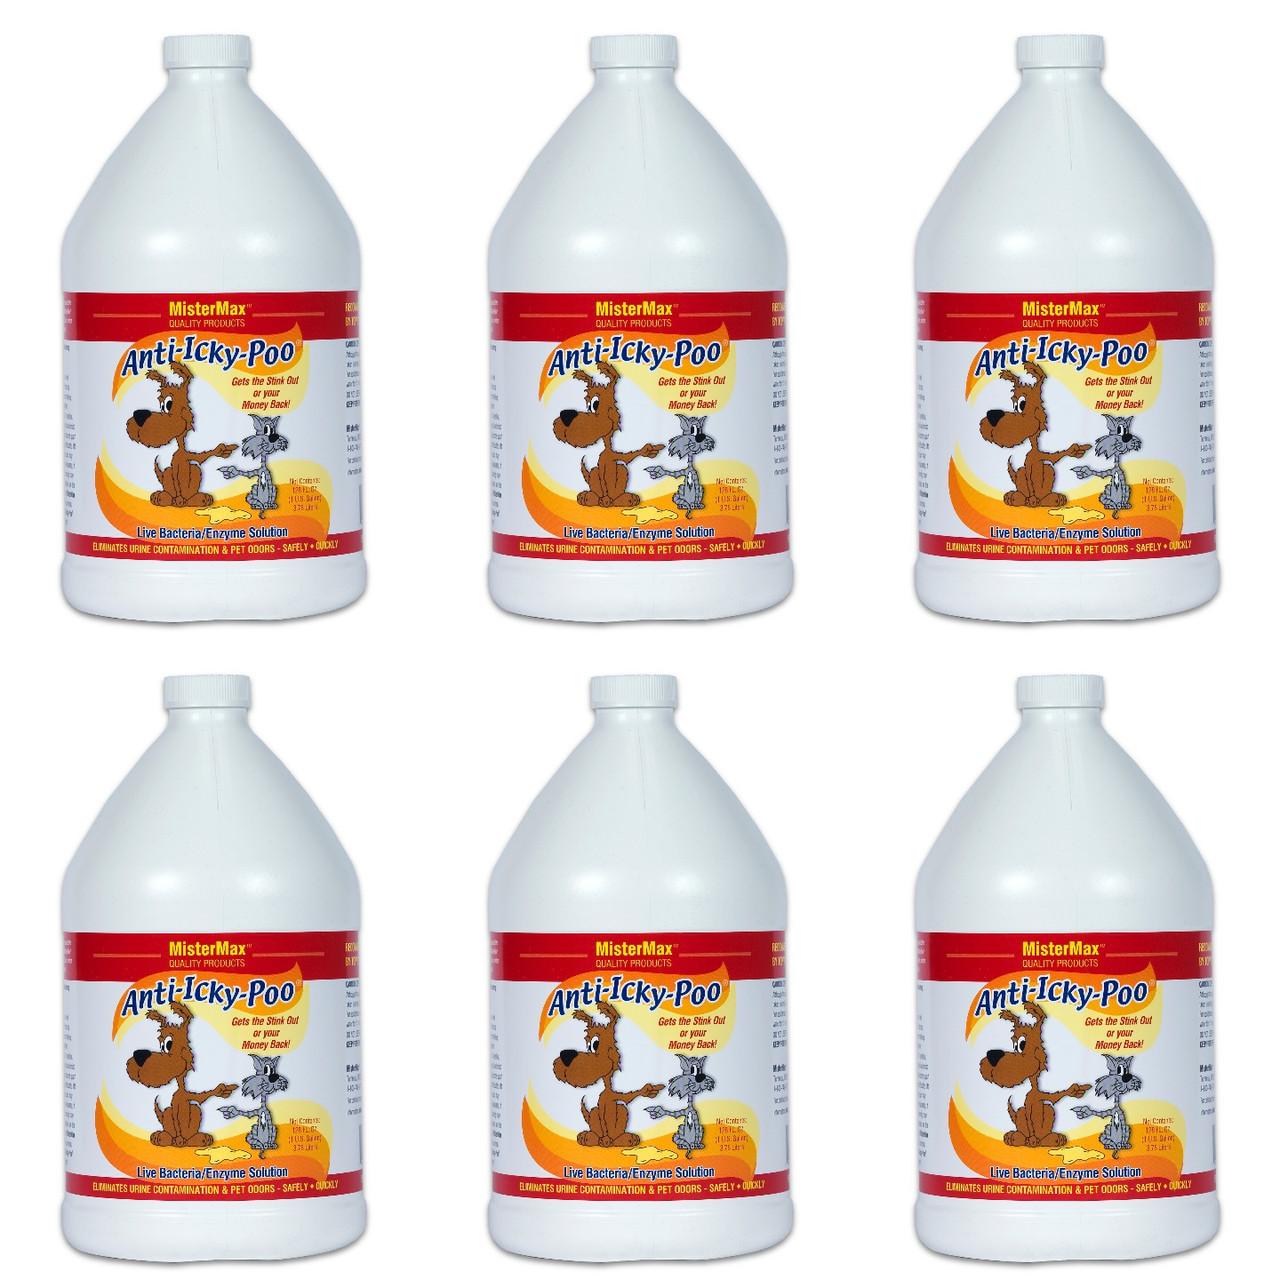 Original Scent Gallons 6 Pack - BEST VALUE